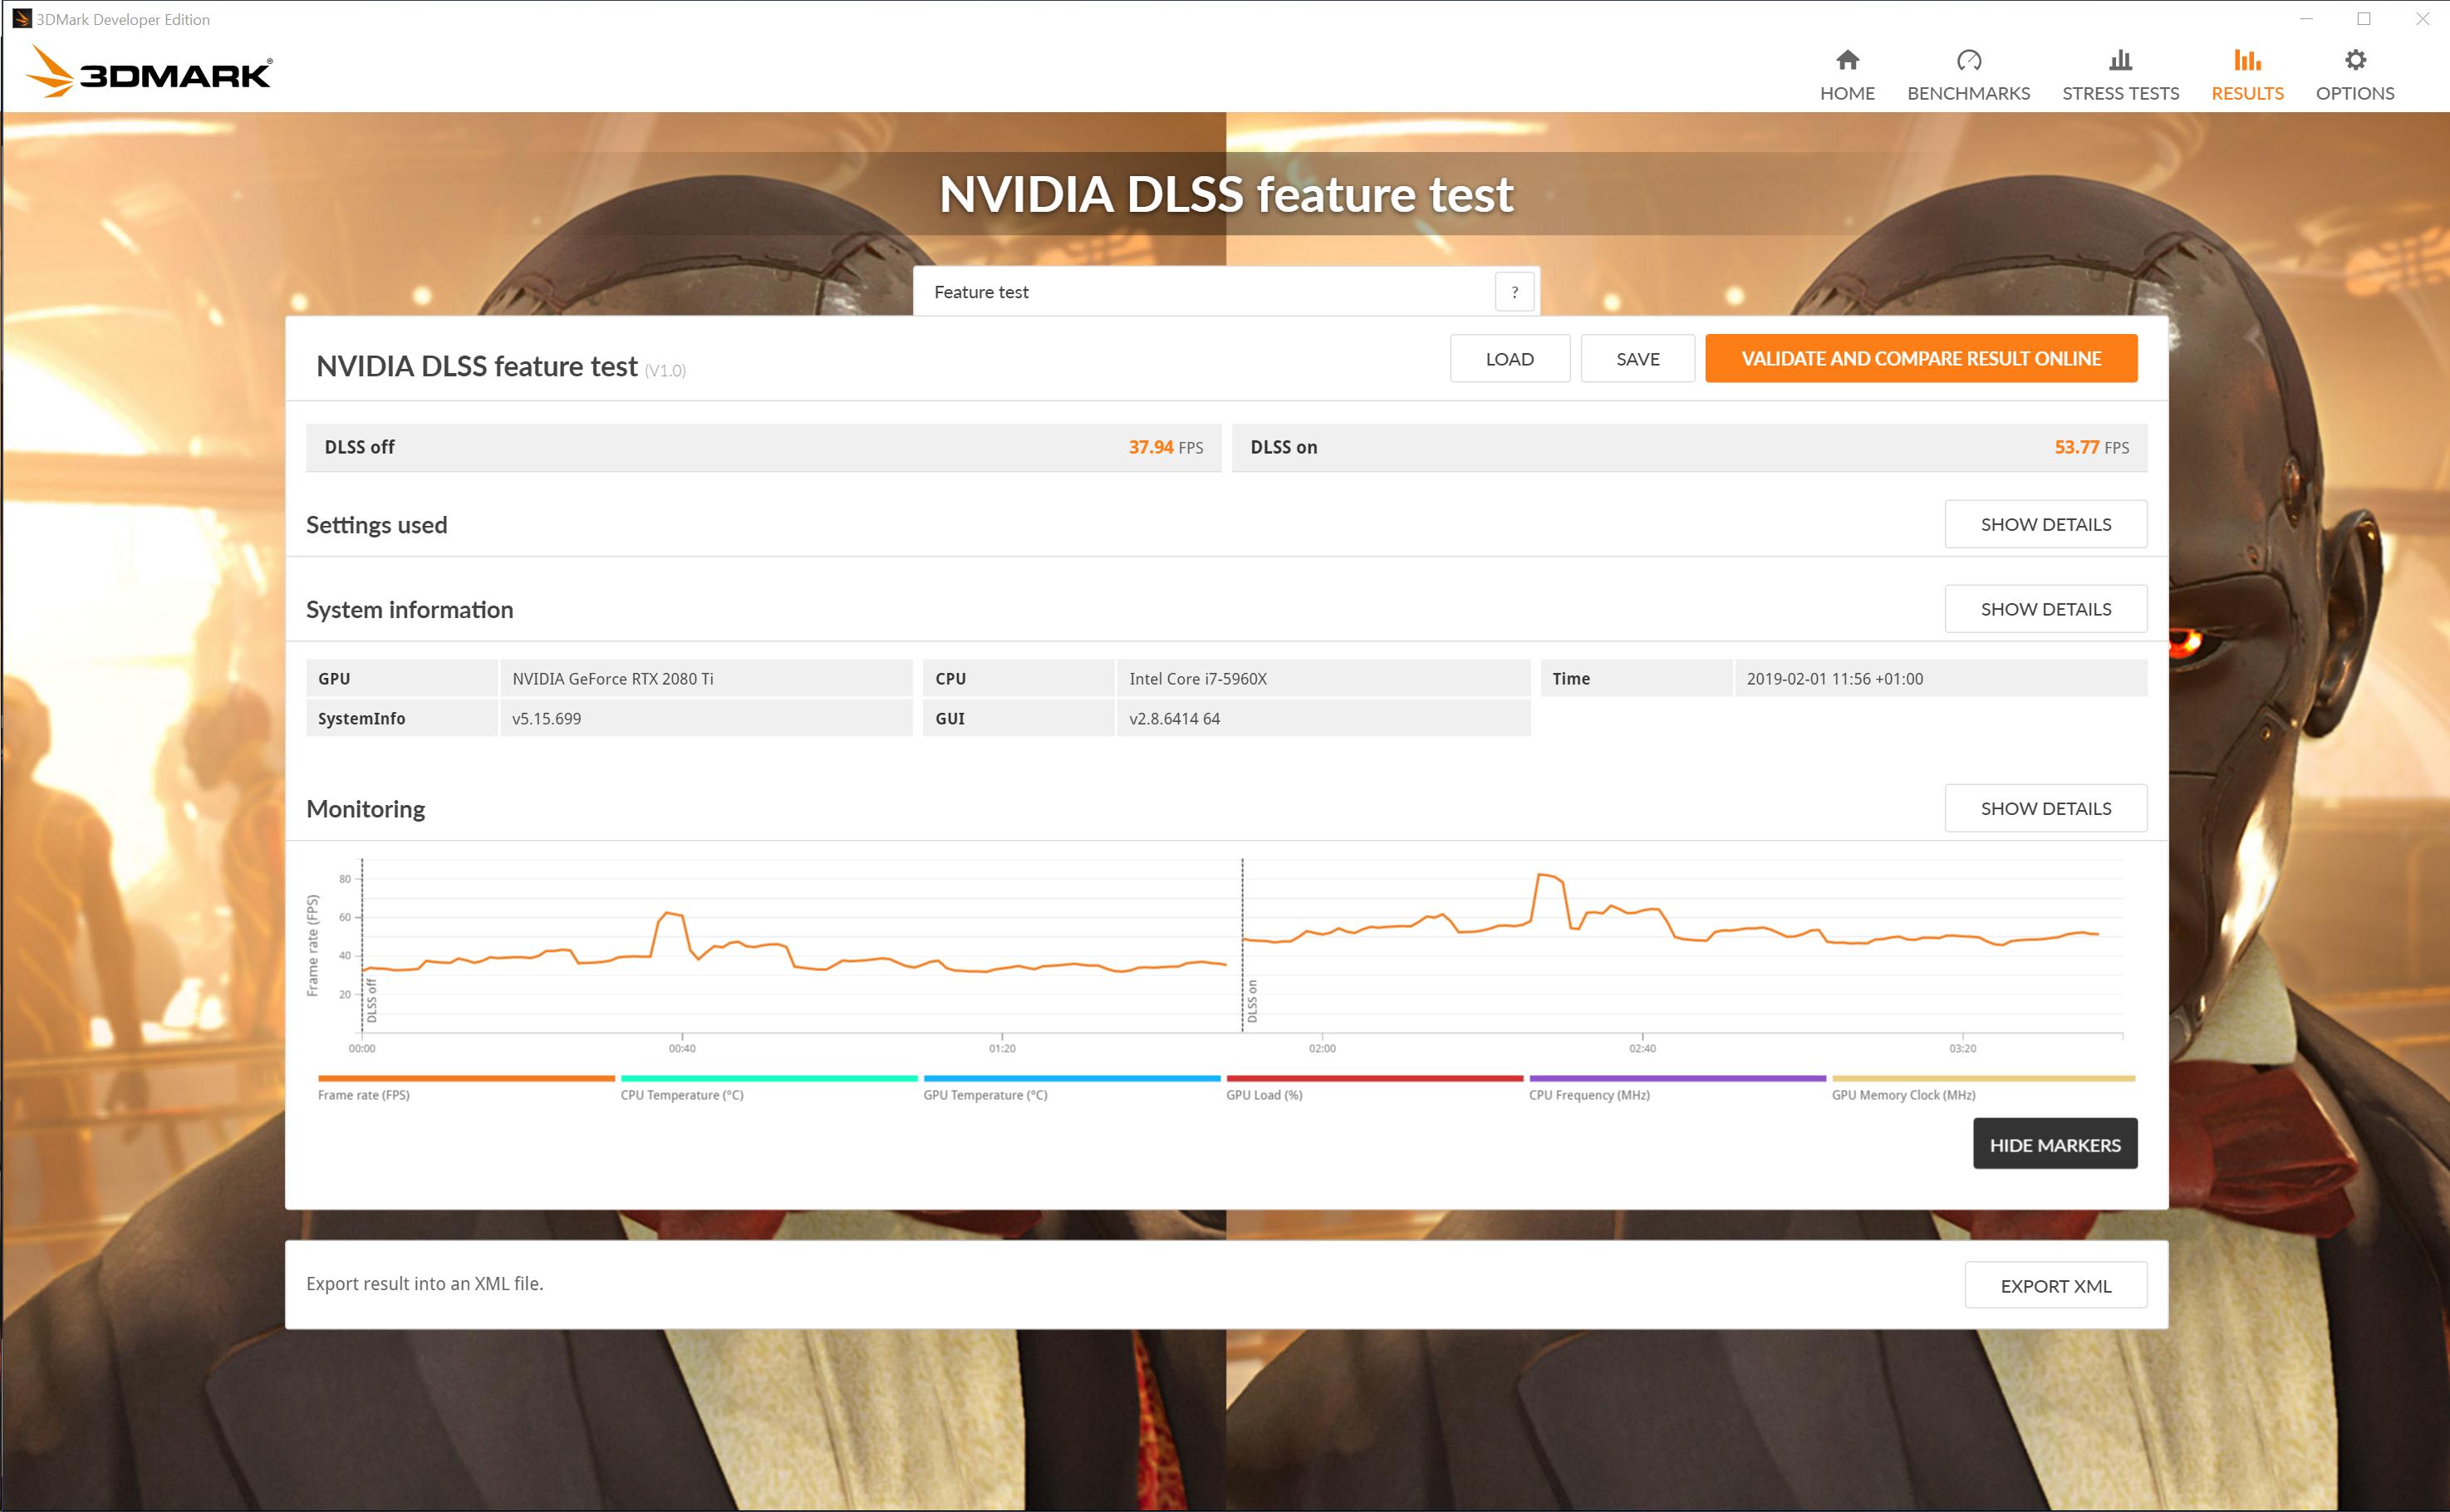 Port Royal Benchmark Adds NVIDIA DLSS For Improved Image